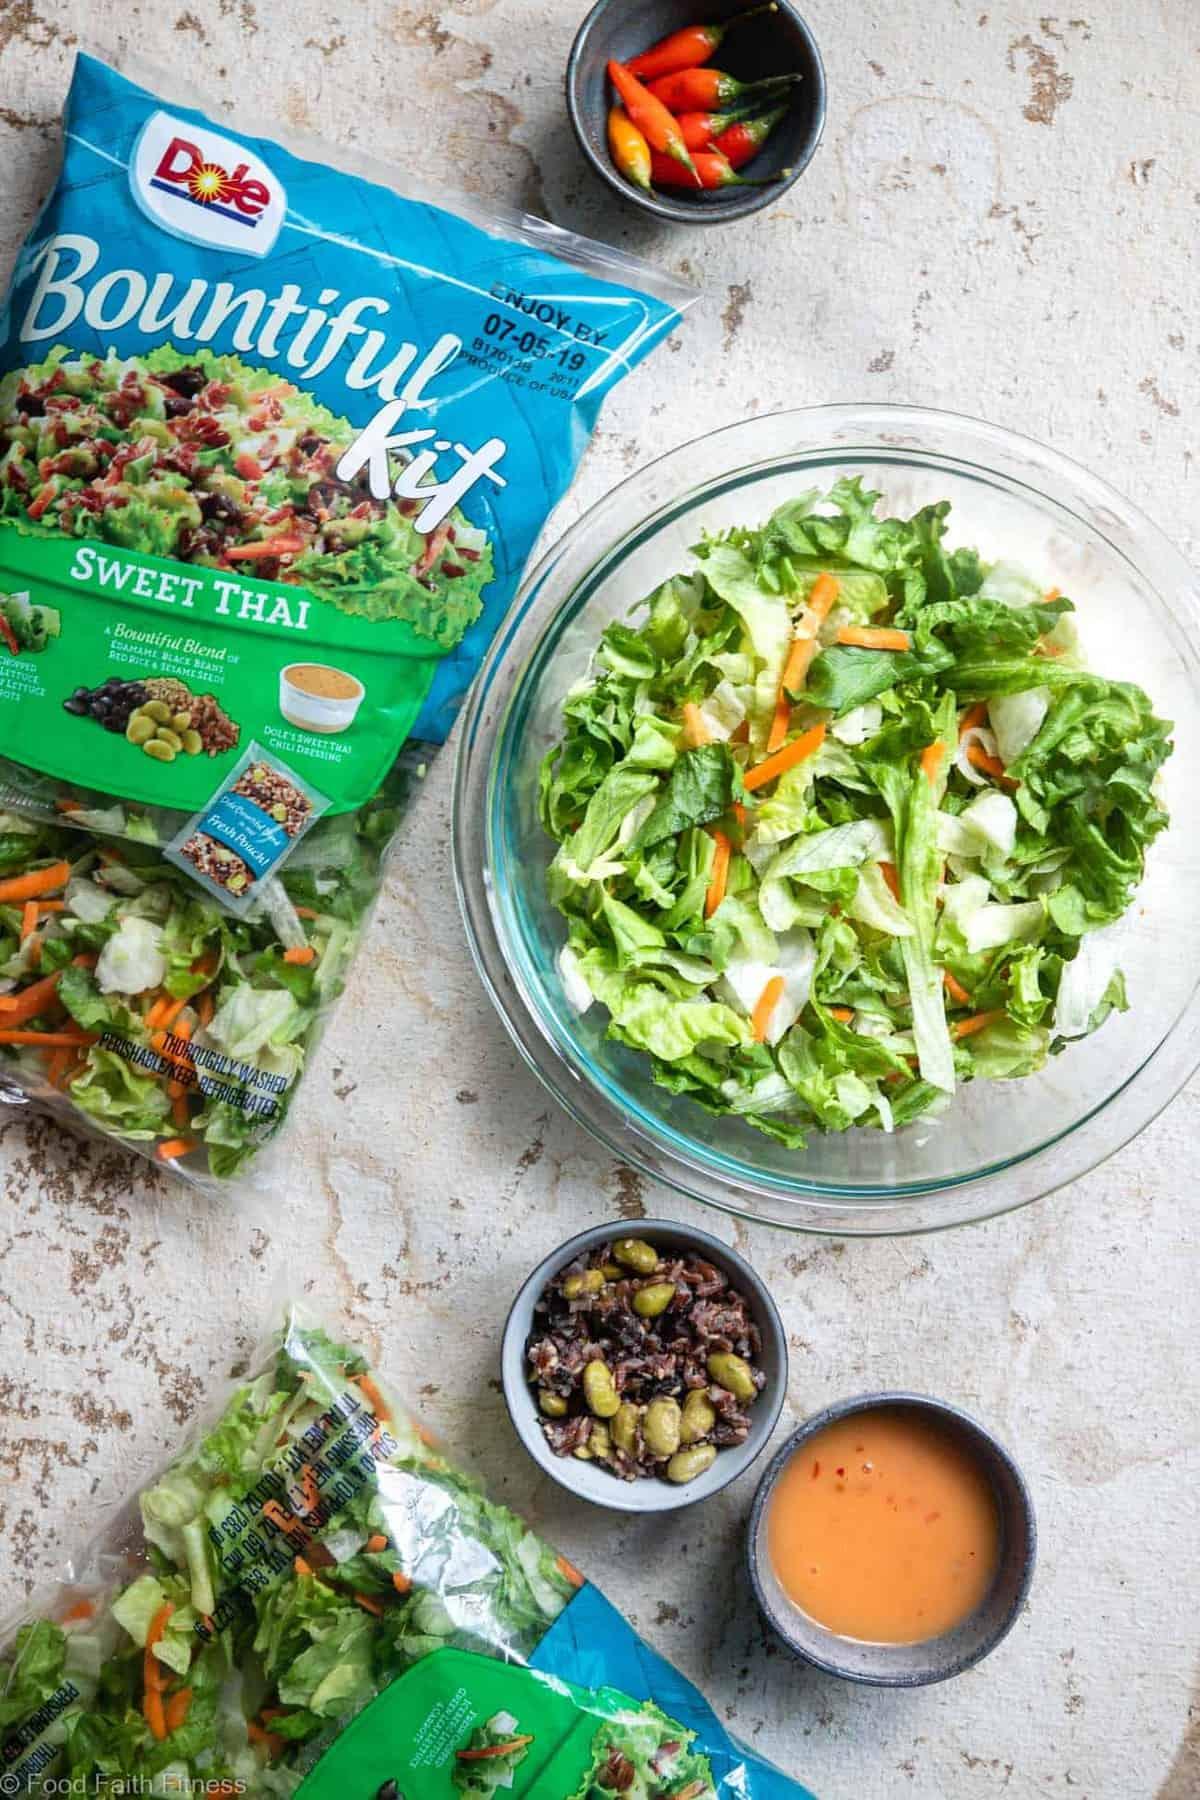 DOLE Bountiful Salad Kit in a bowl for Thai steak salad